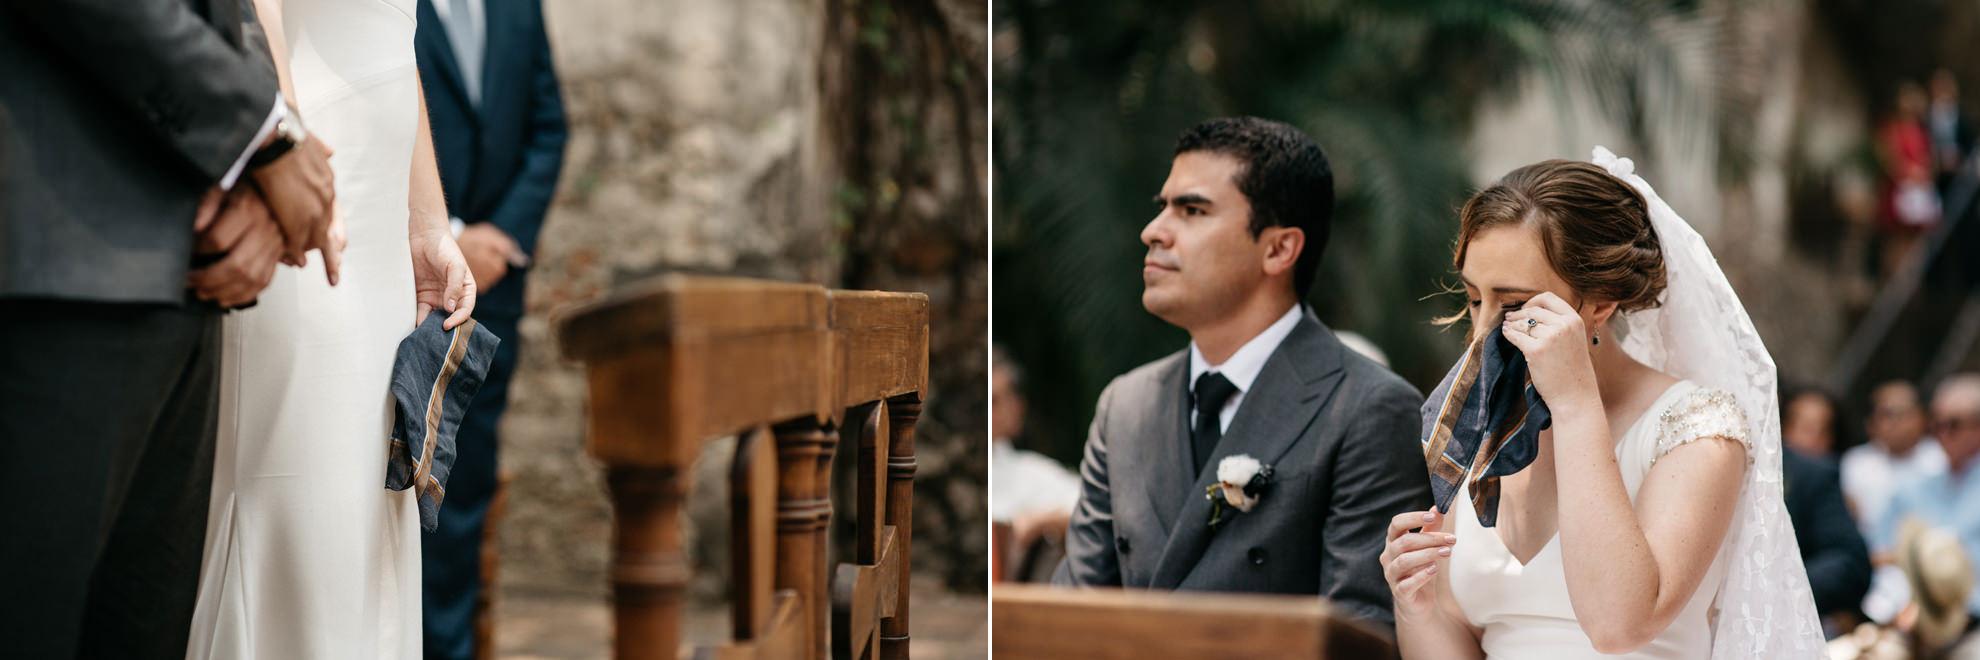 039 - wedding hacienda san carlos.jpg